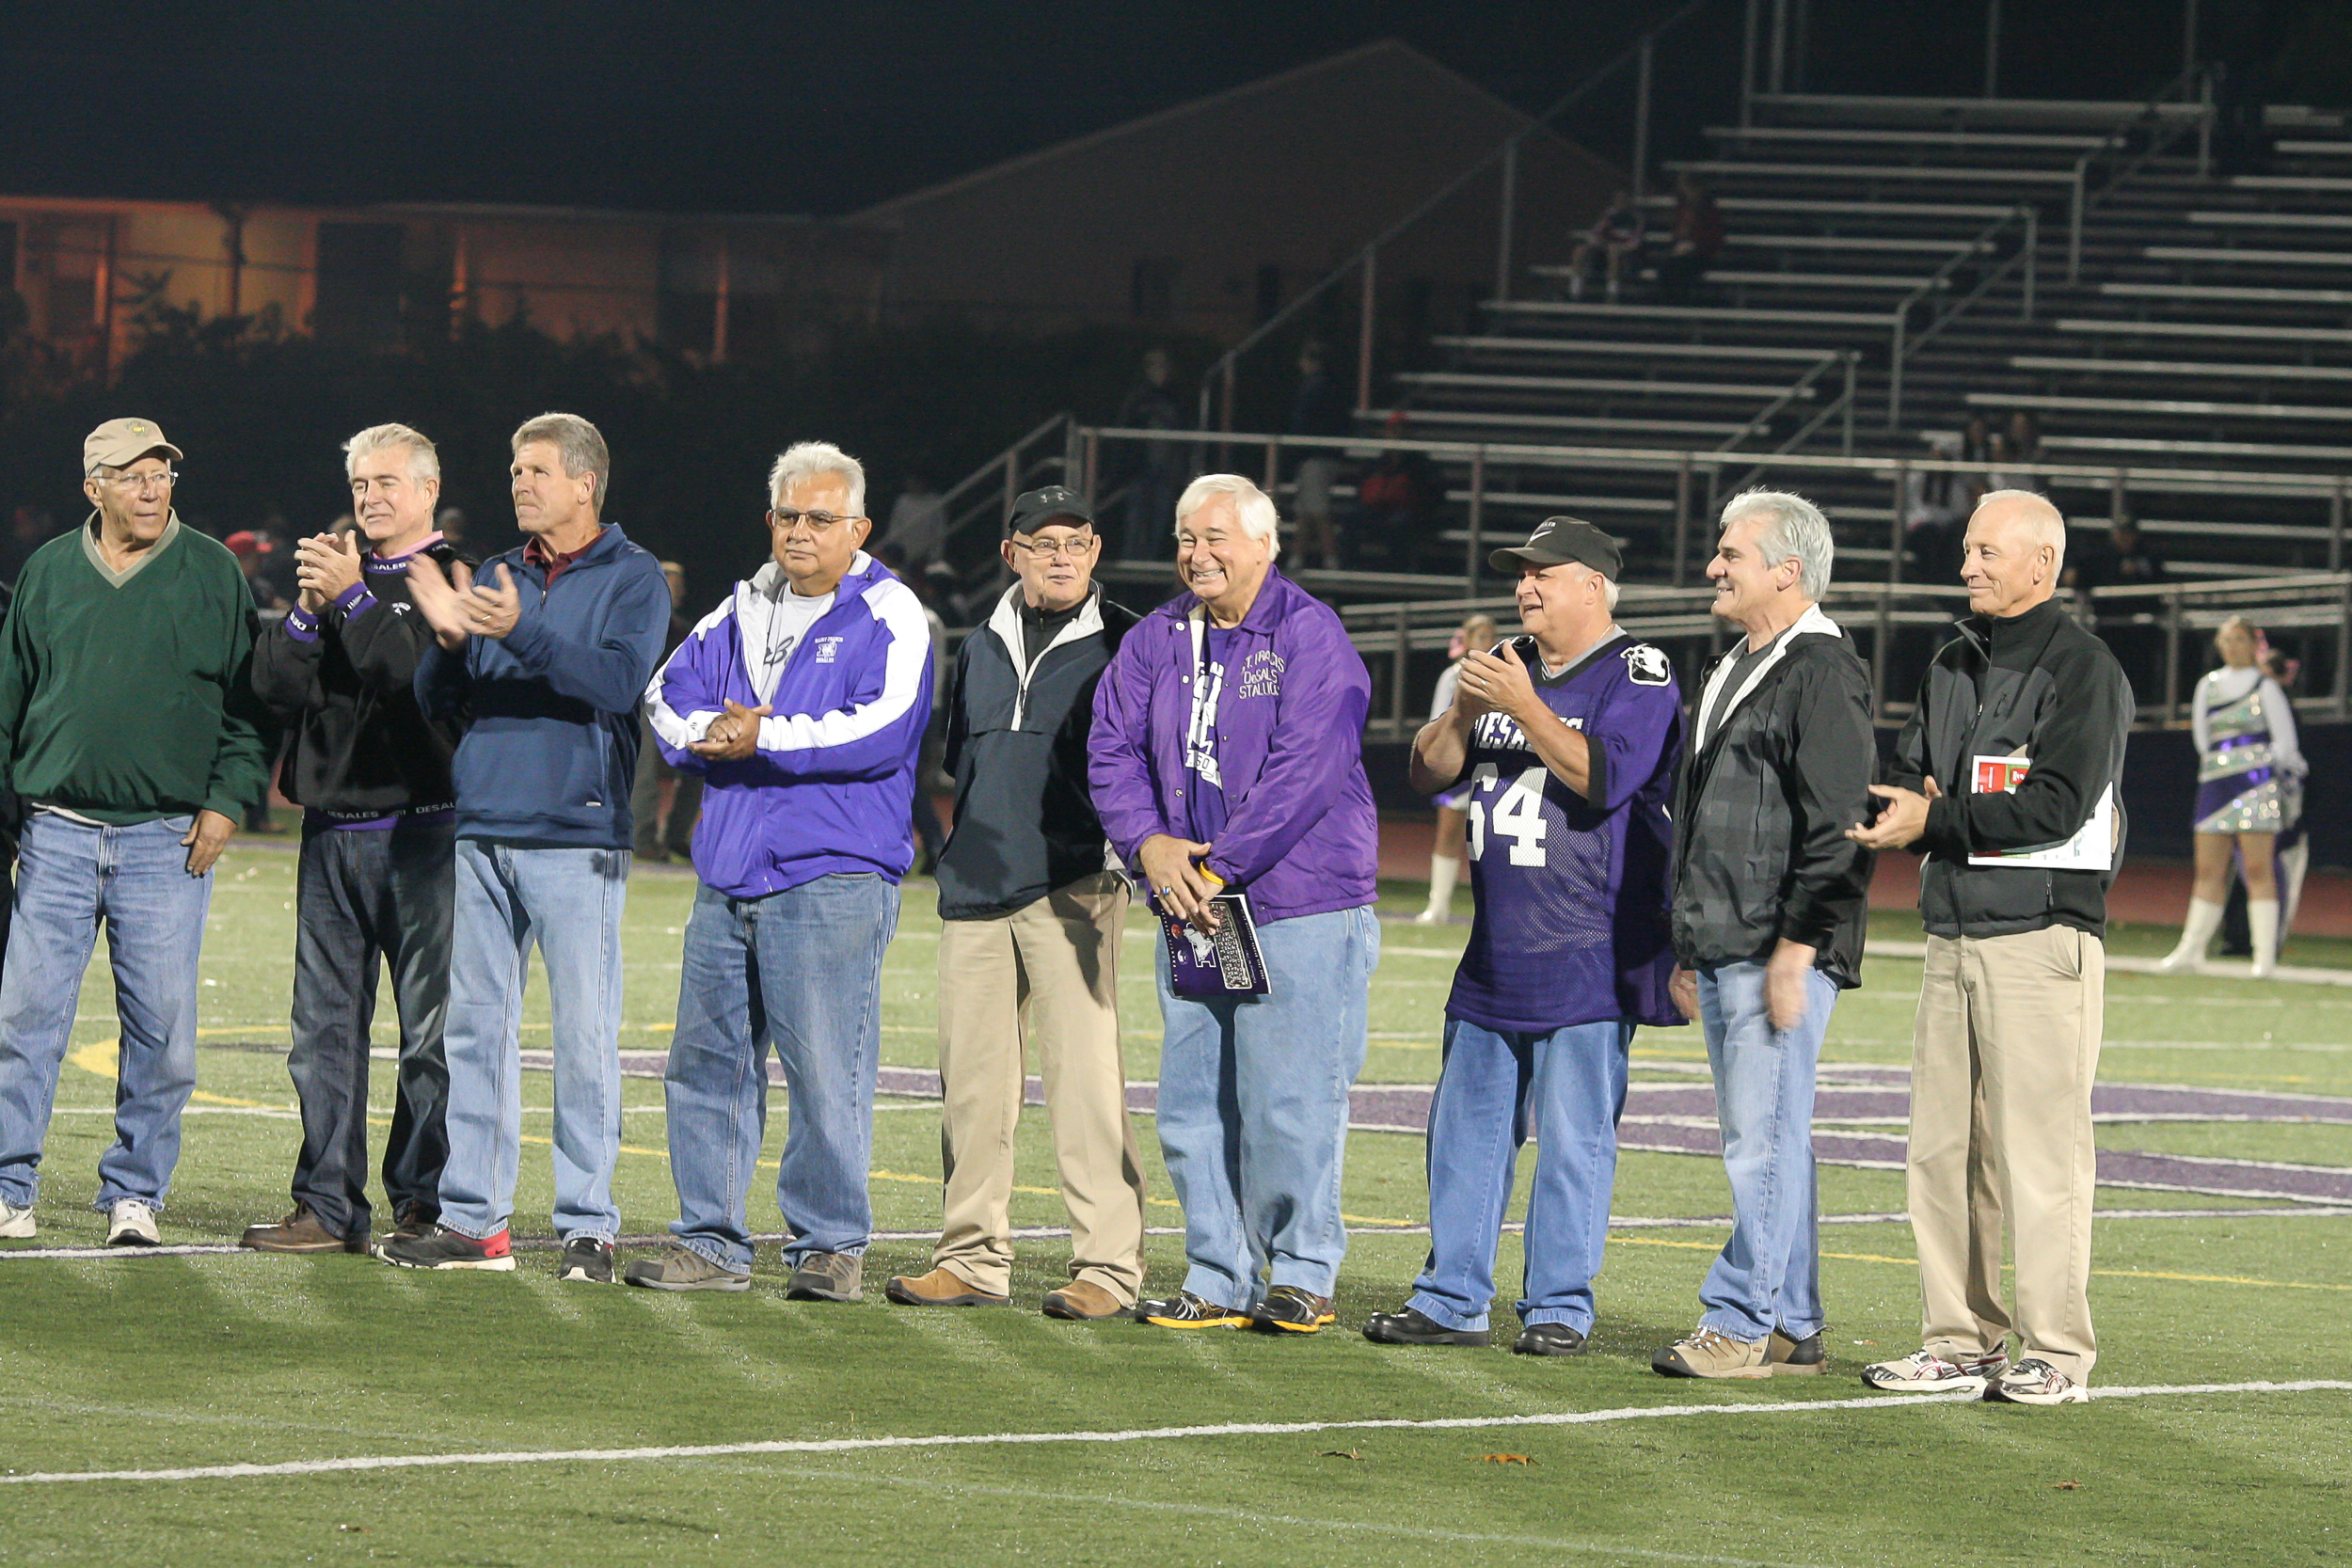 Celebrating the 50 year anniversary of the 1964 CCL Championship Team  Alumni Stadium 10/3/2014